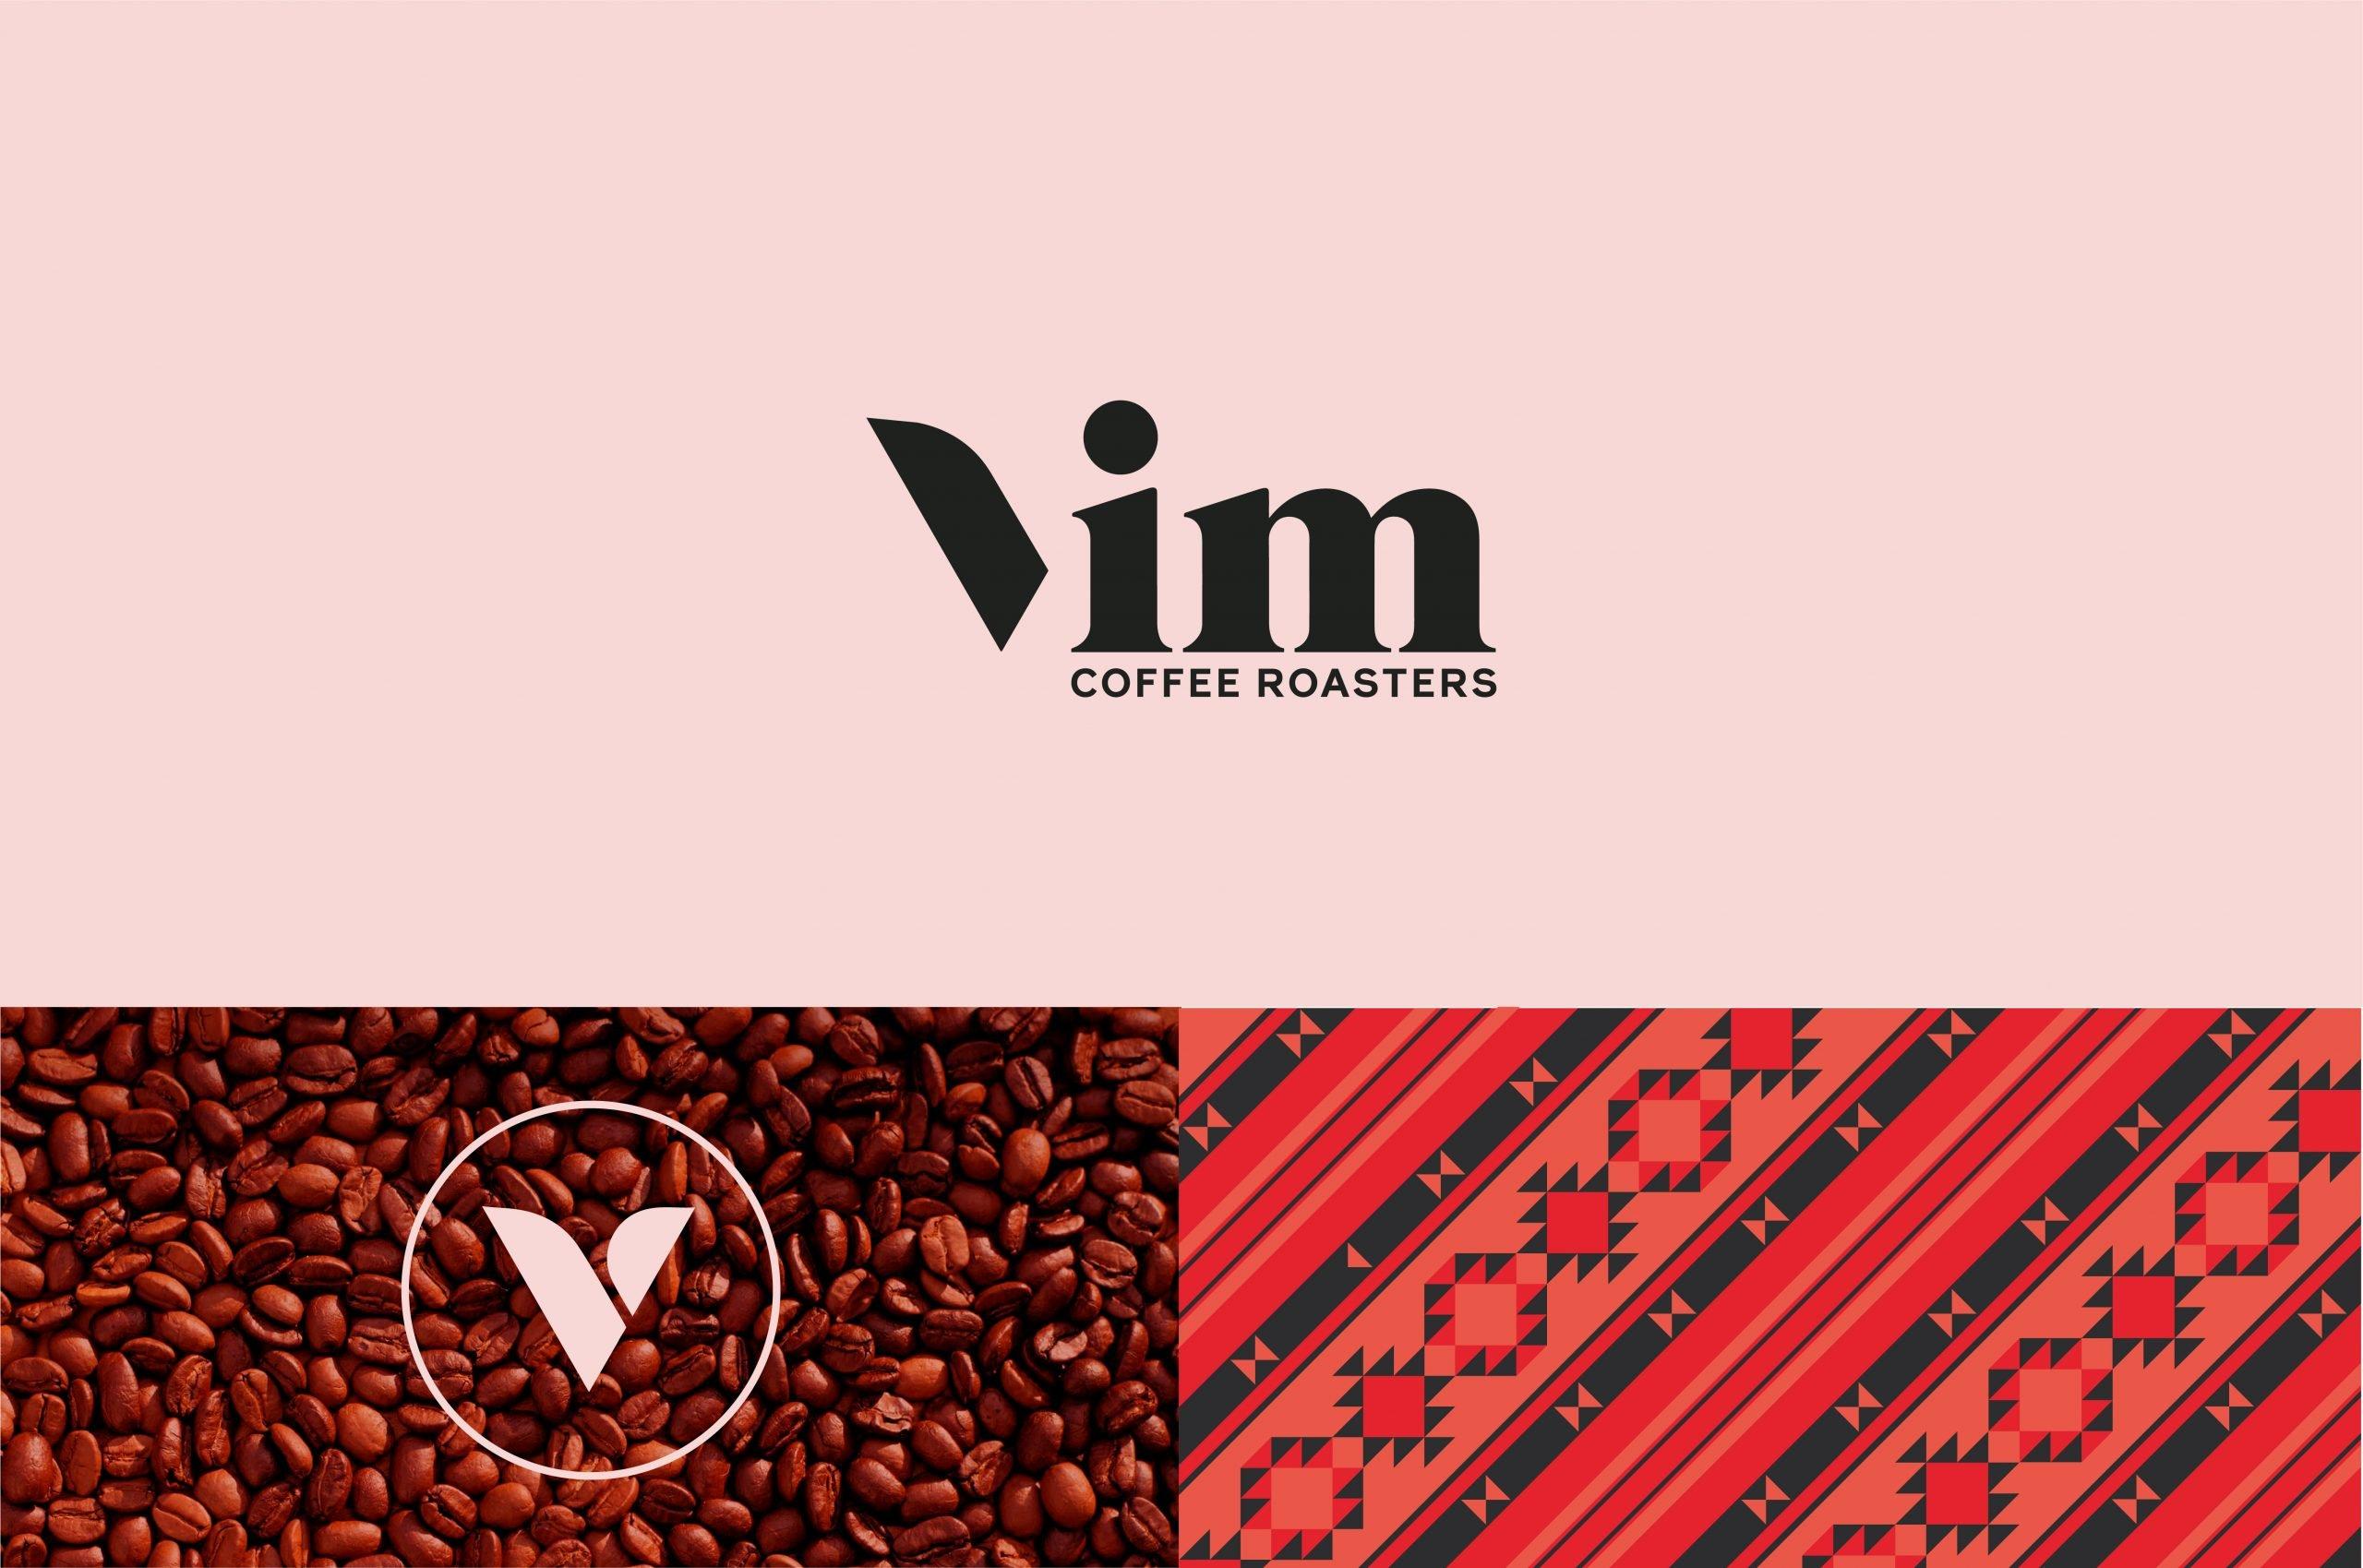 Vim Coffee Roasters